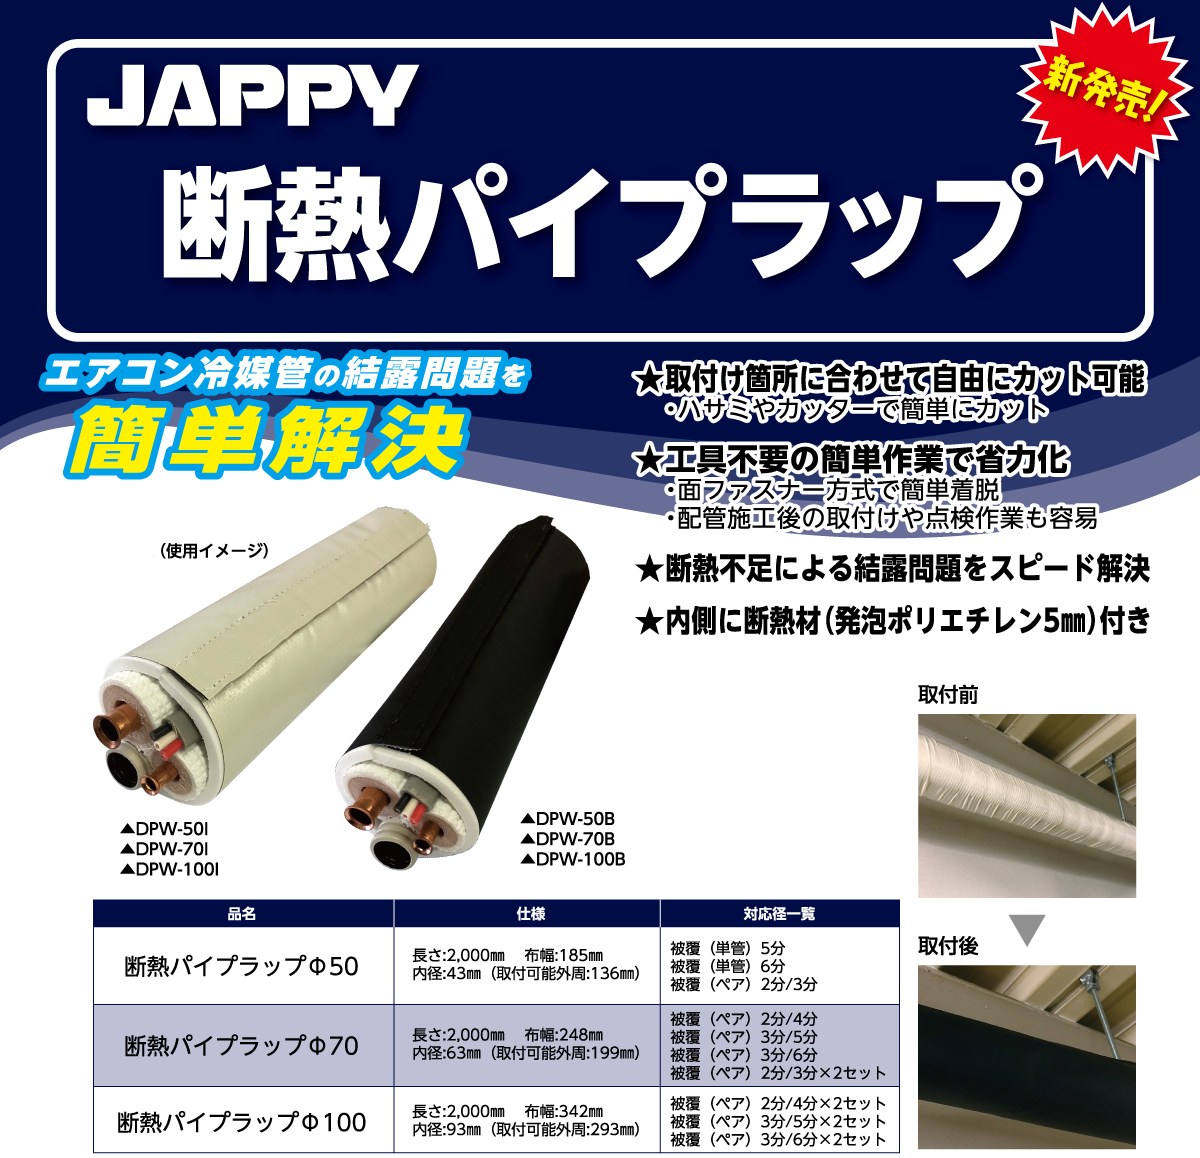 【JAPPY】エアコン冷媒管の結露問題を簡単解決!! 断熱パイプラップ新発売の画像